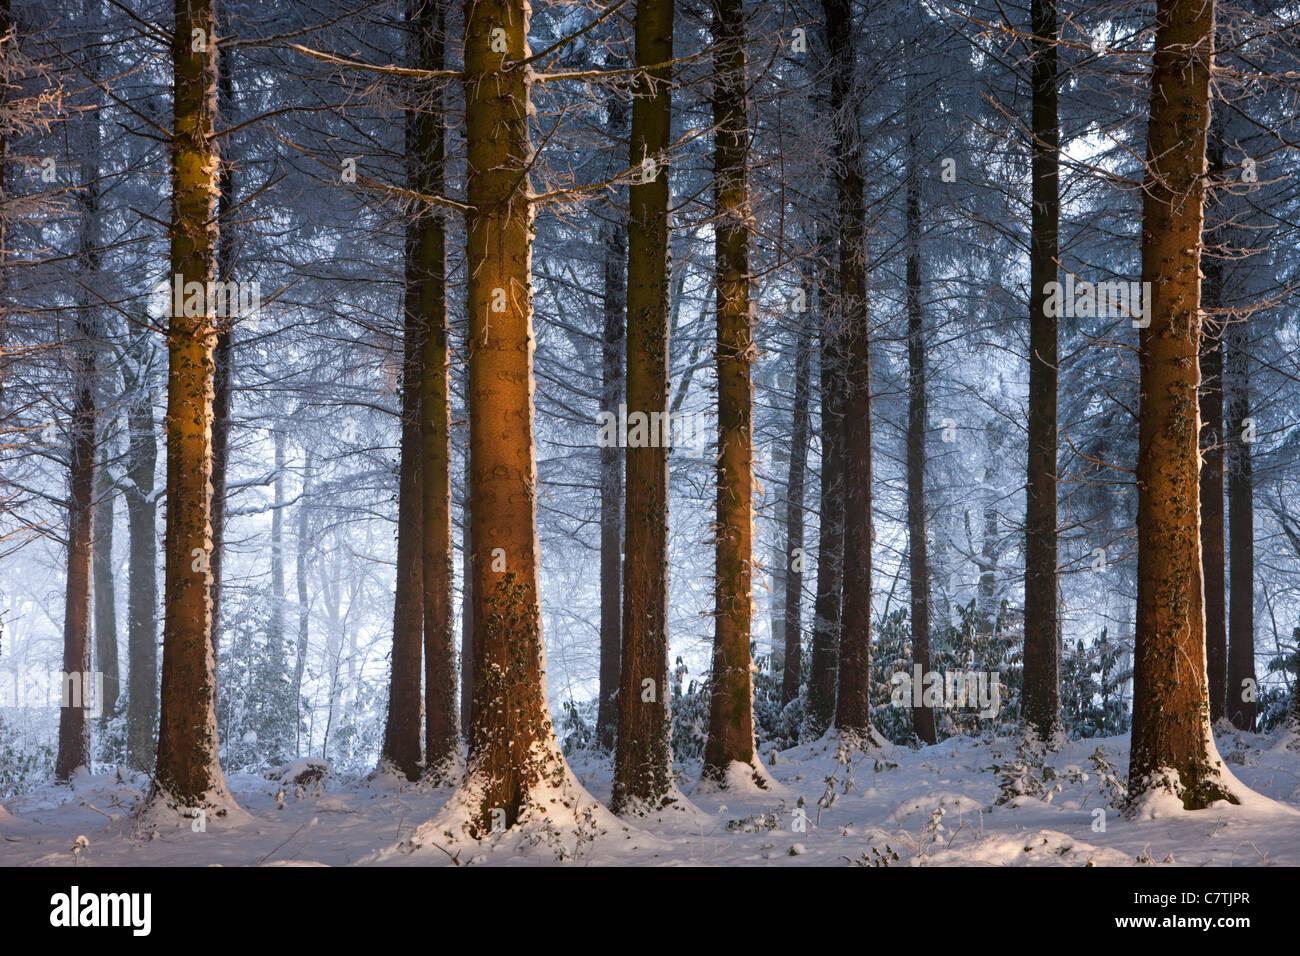 Cubiertas de Nieve, bosque invernal Morchard Madera, Devon, Inglaterra. De diciembre de 2010. Imagen De Stock